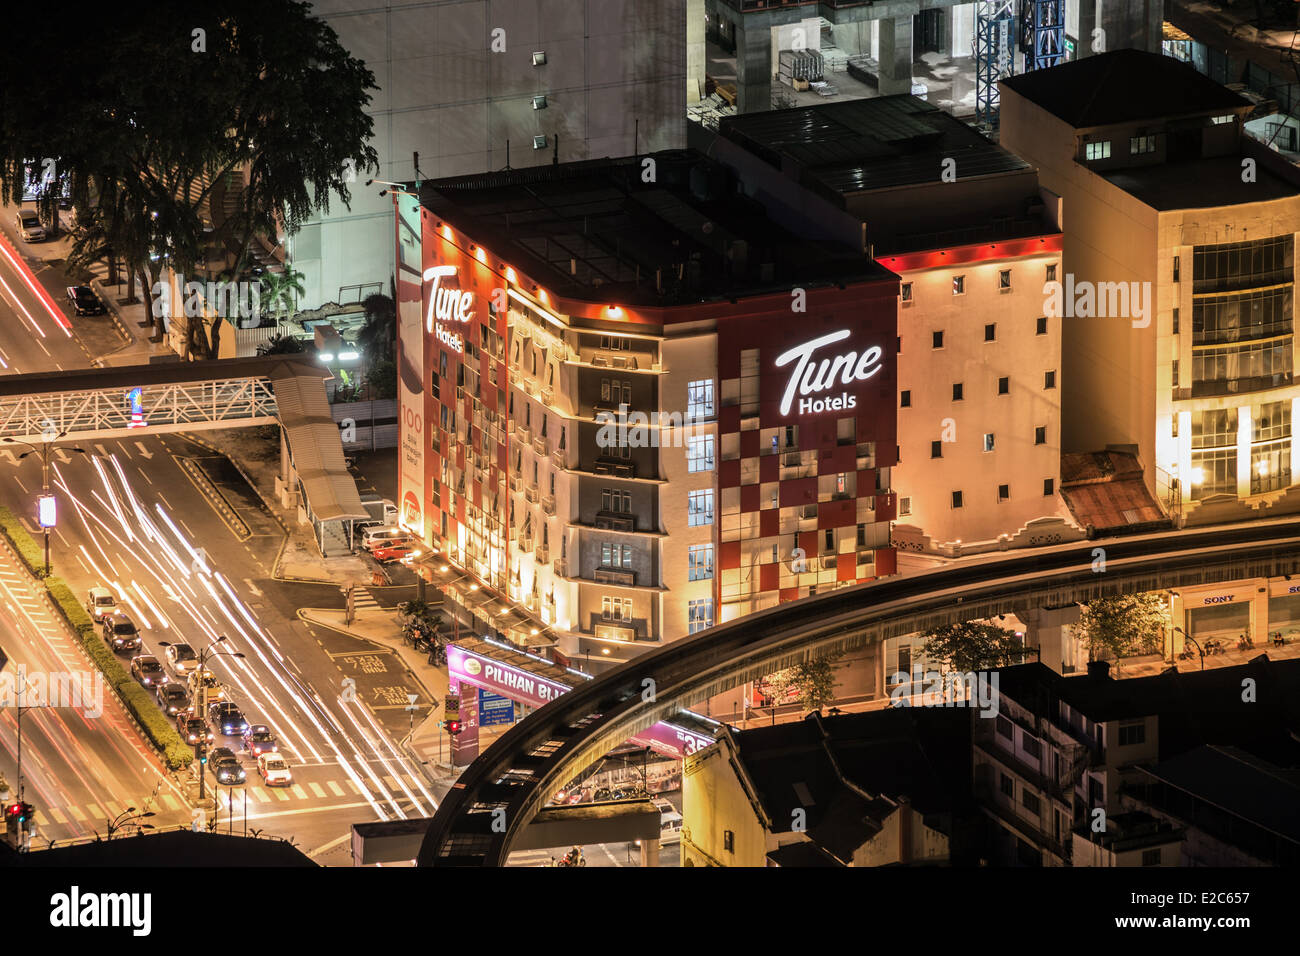 Tune Hotel Kuala Lumpur, seen from Menara Kuala Lumpur - Stock Image